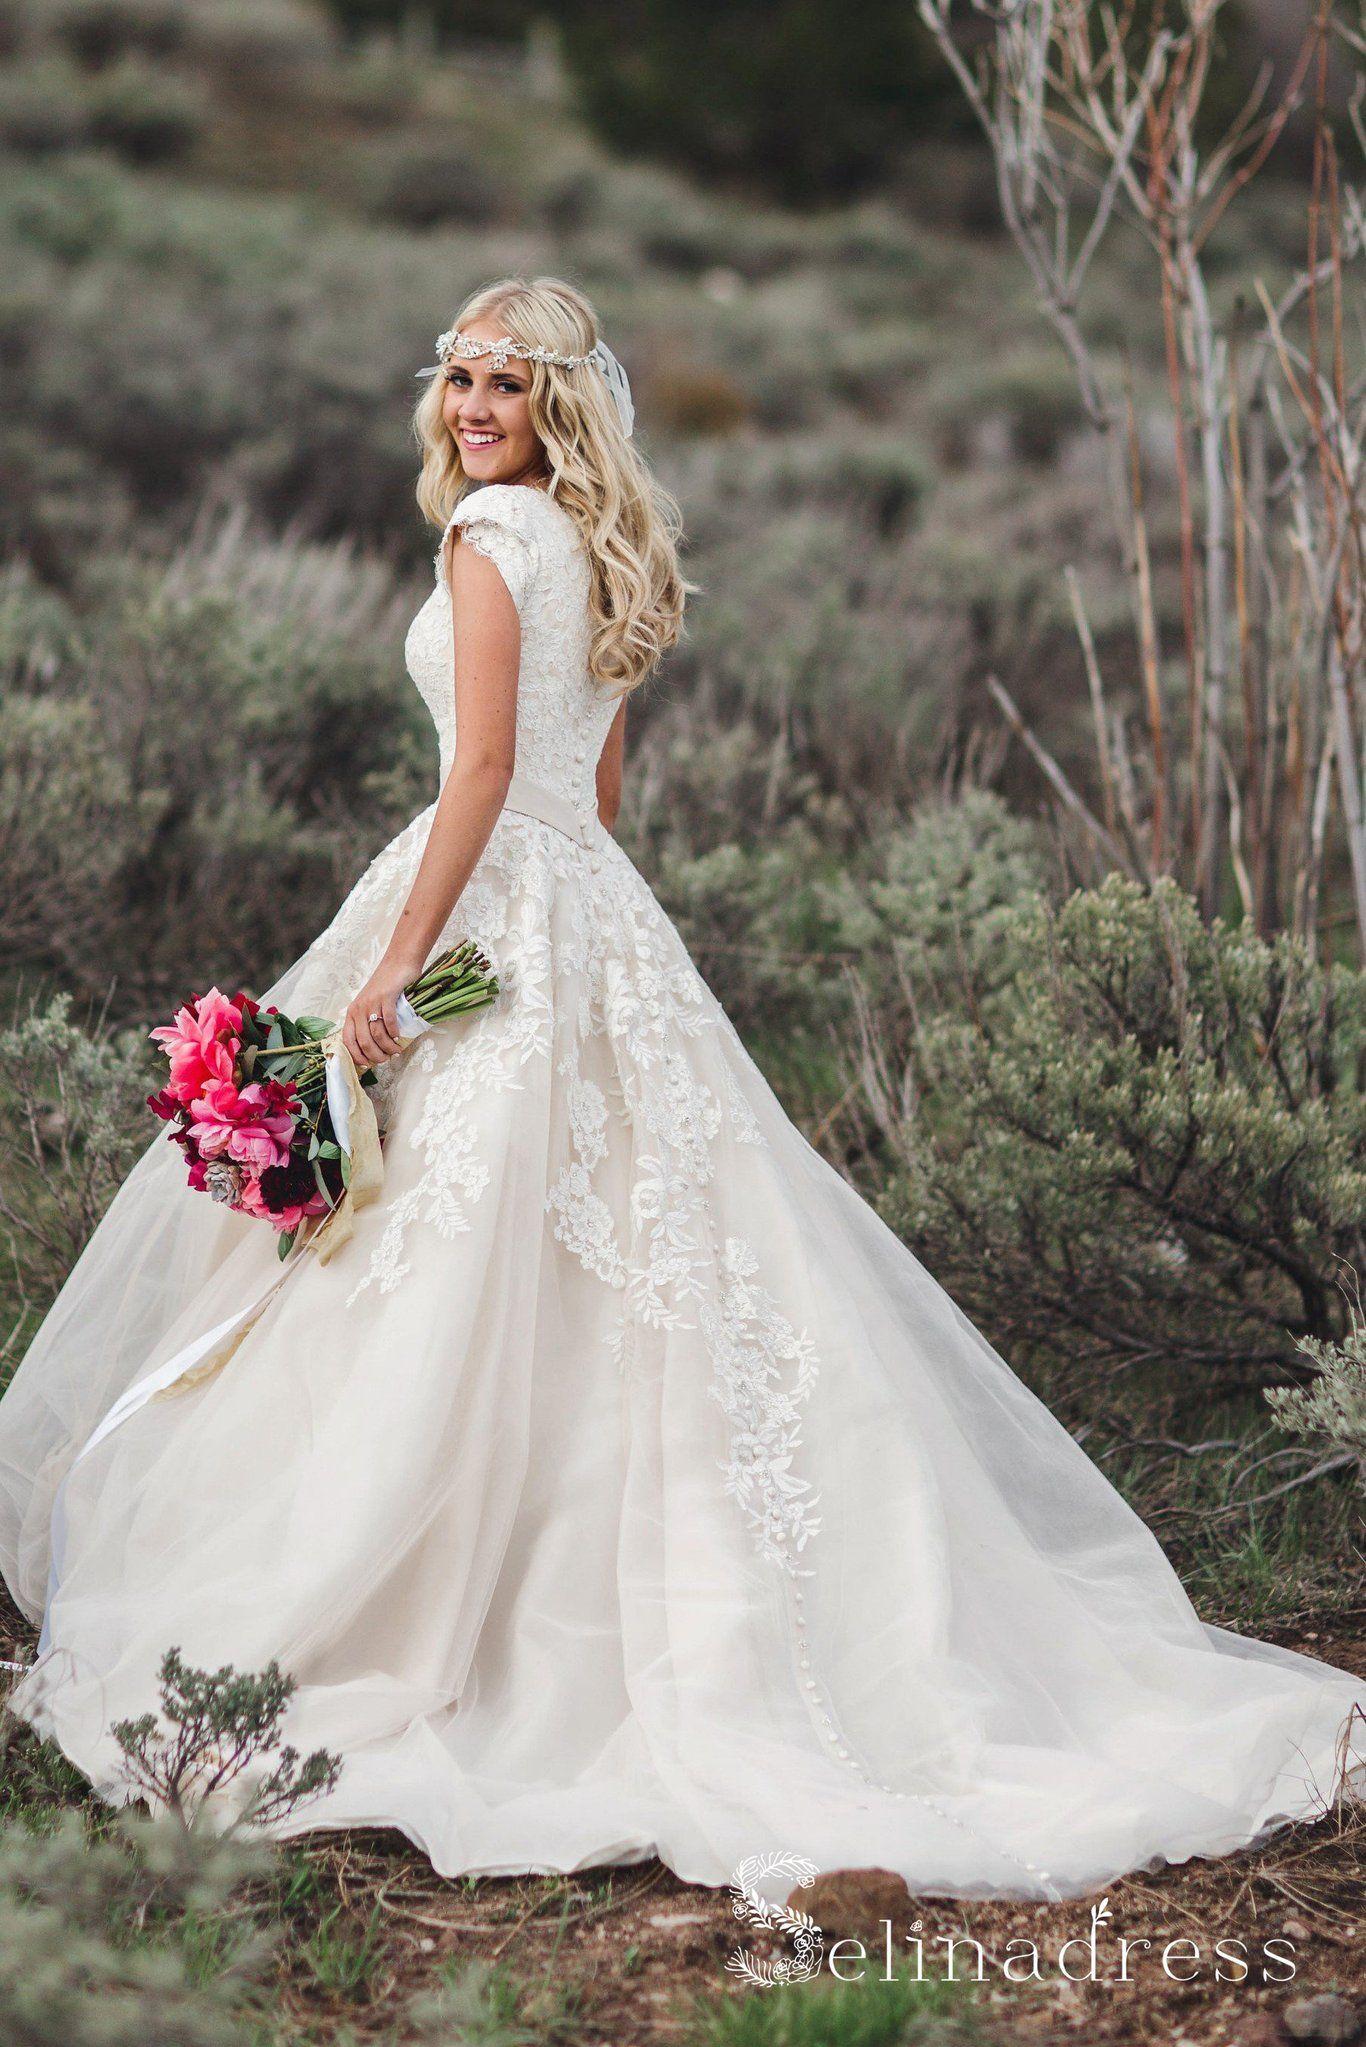 Country Wedding Dress With Sleeves Weddings234 Modest Wedding Dresses Country Wedding Dresses Rustic Wedding Dresses [ 2047 x 1366 Pixel ]